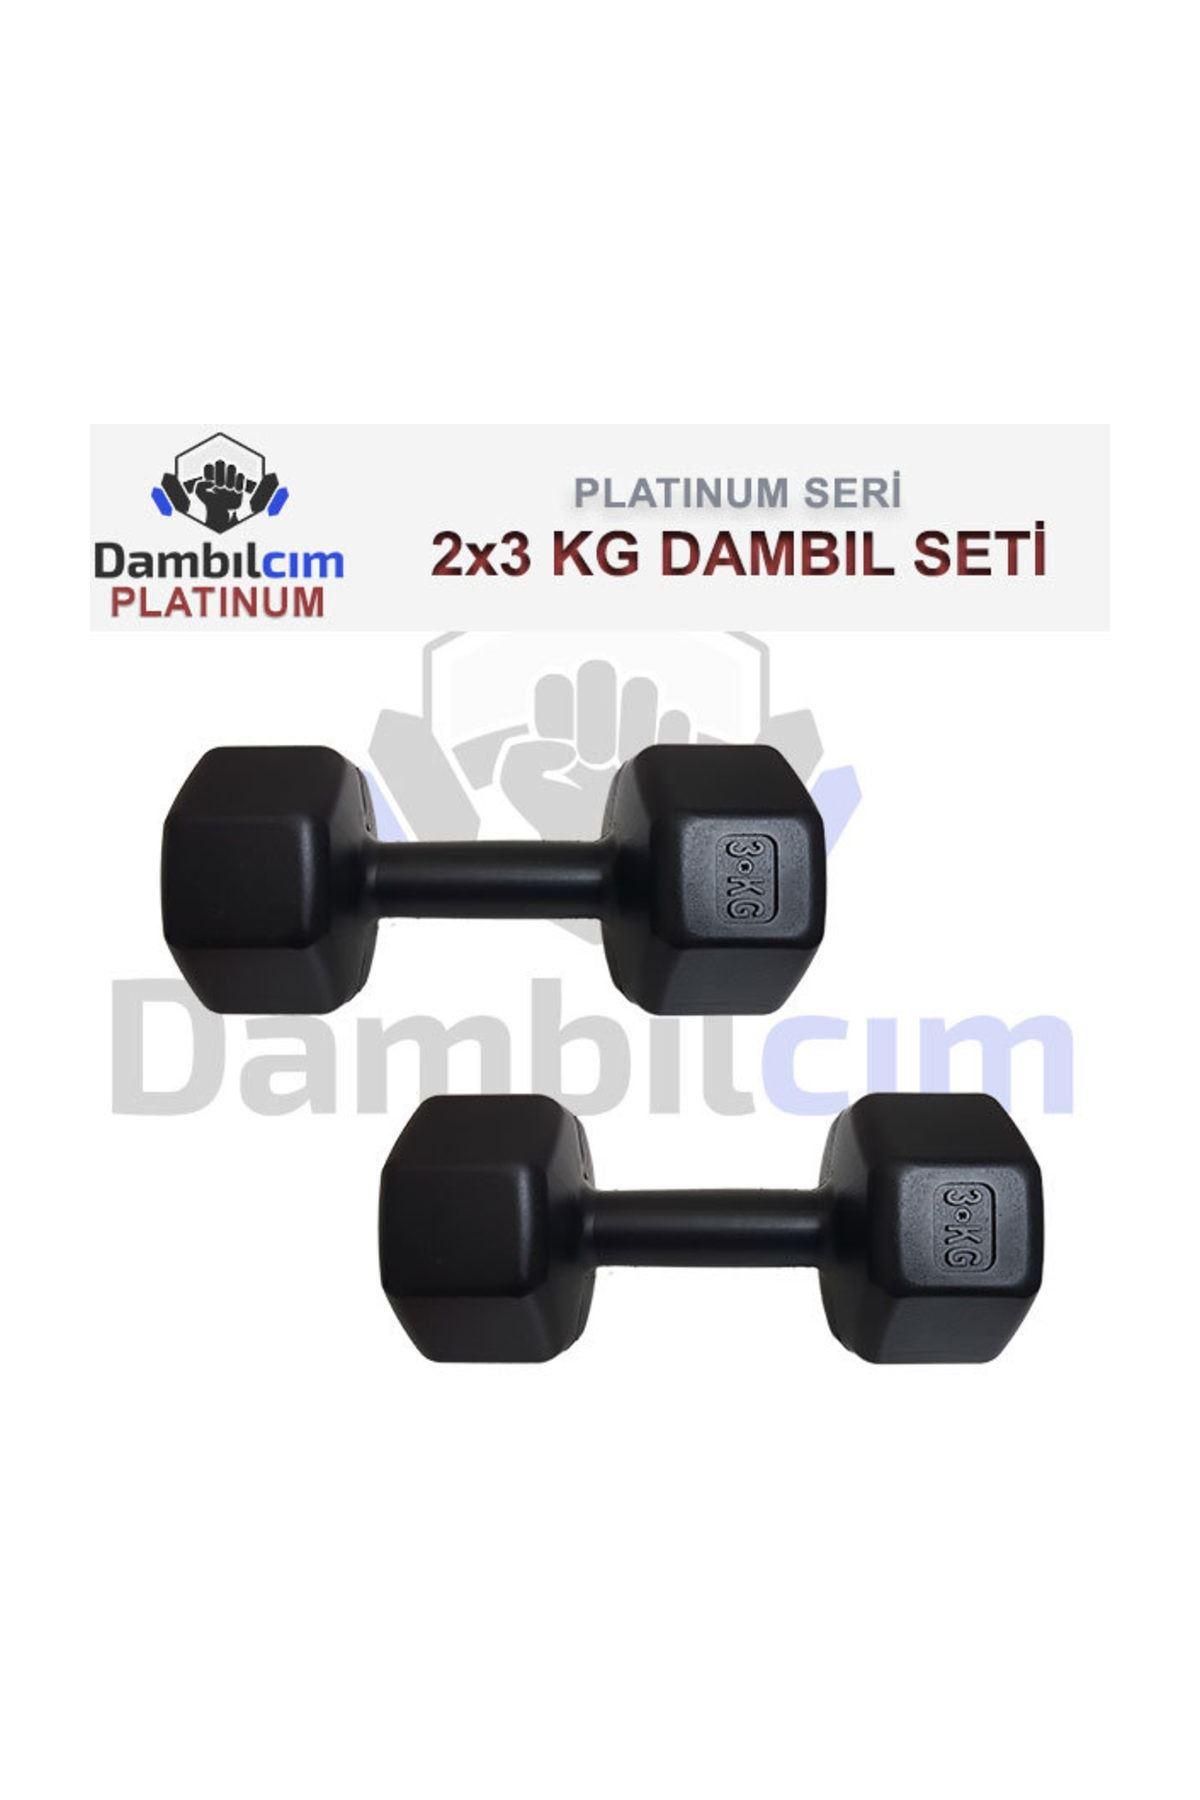 Dambılcım 3 KG x 2 Adet 6 KG Dambıl Seti 6 KG Dumbell Set